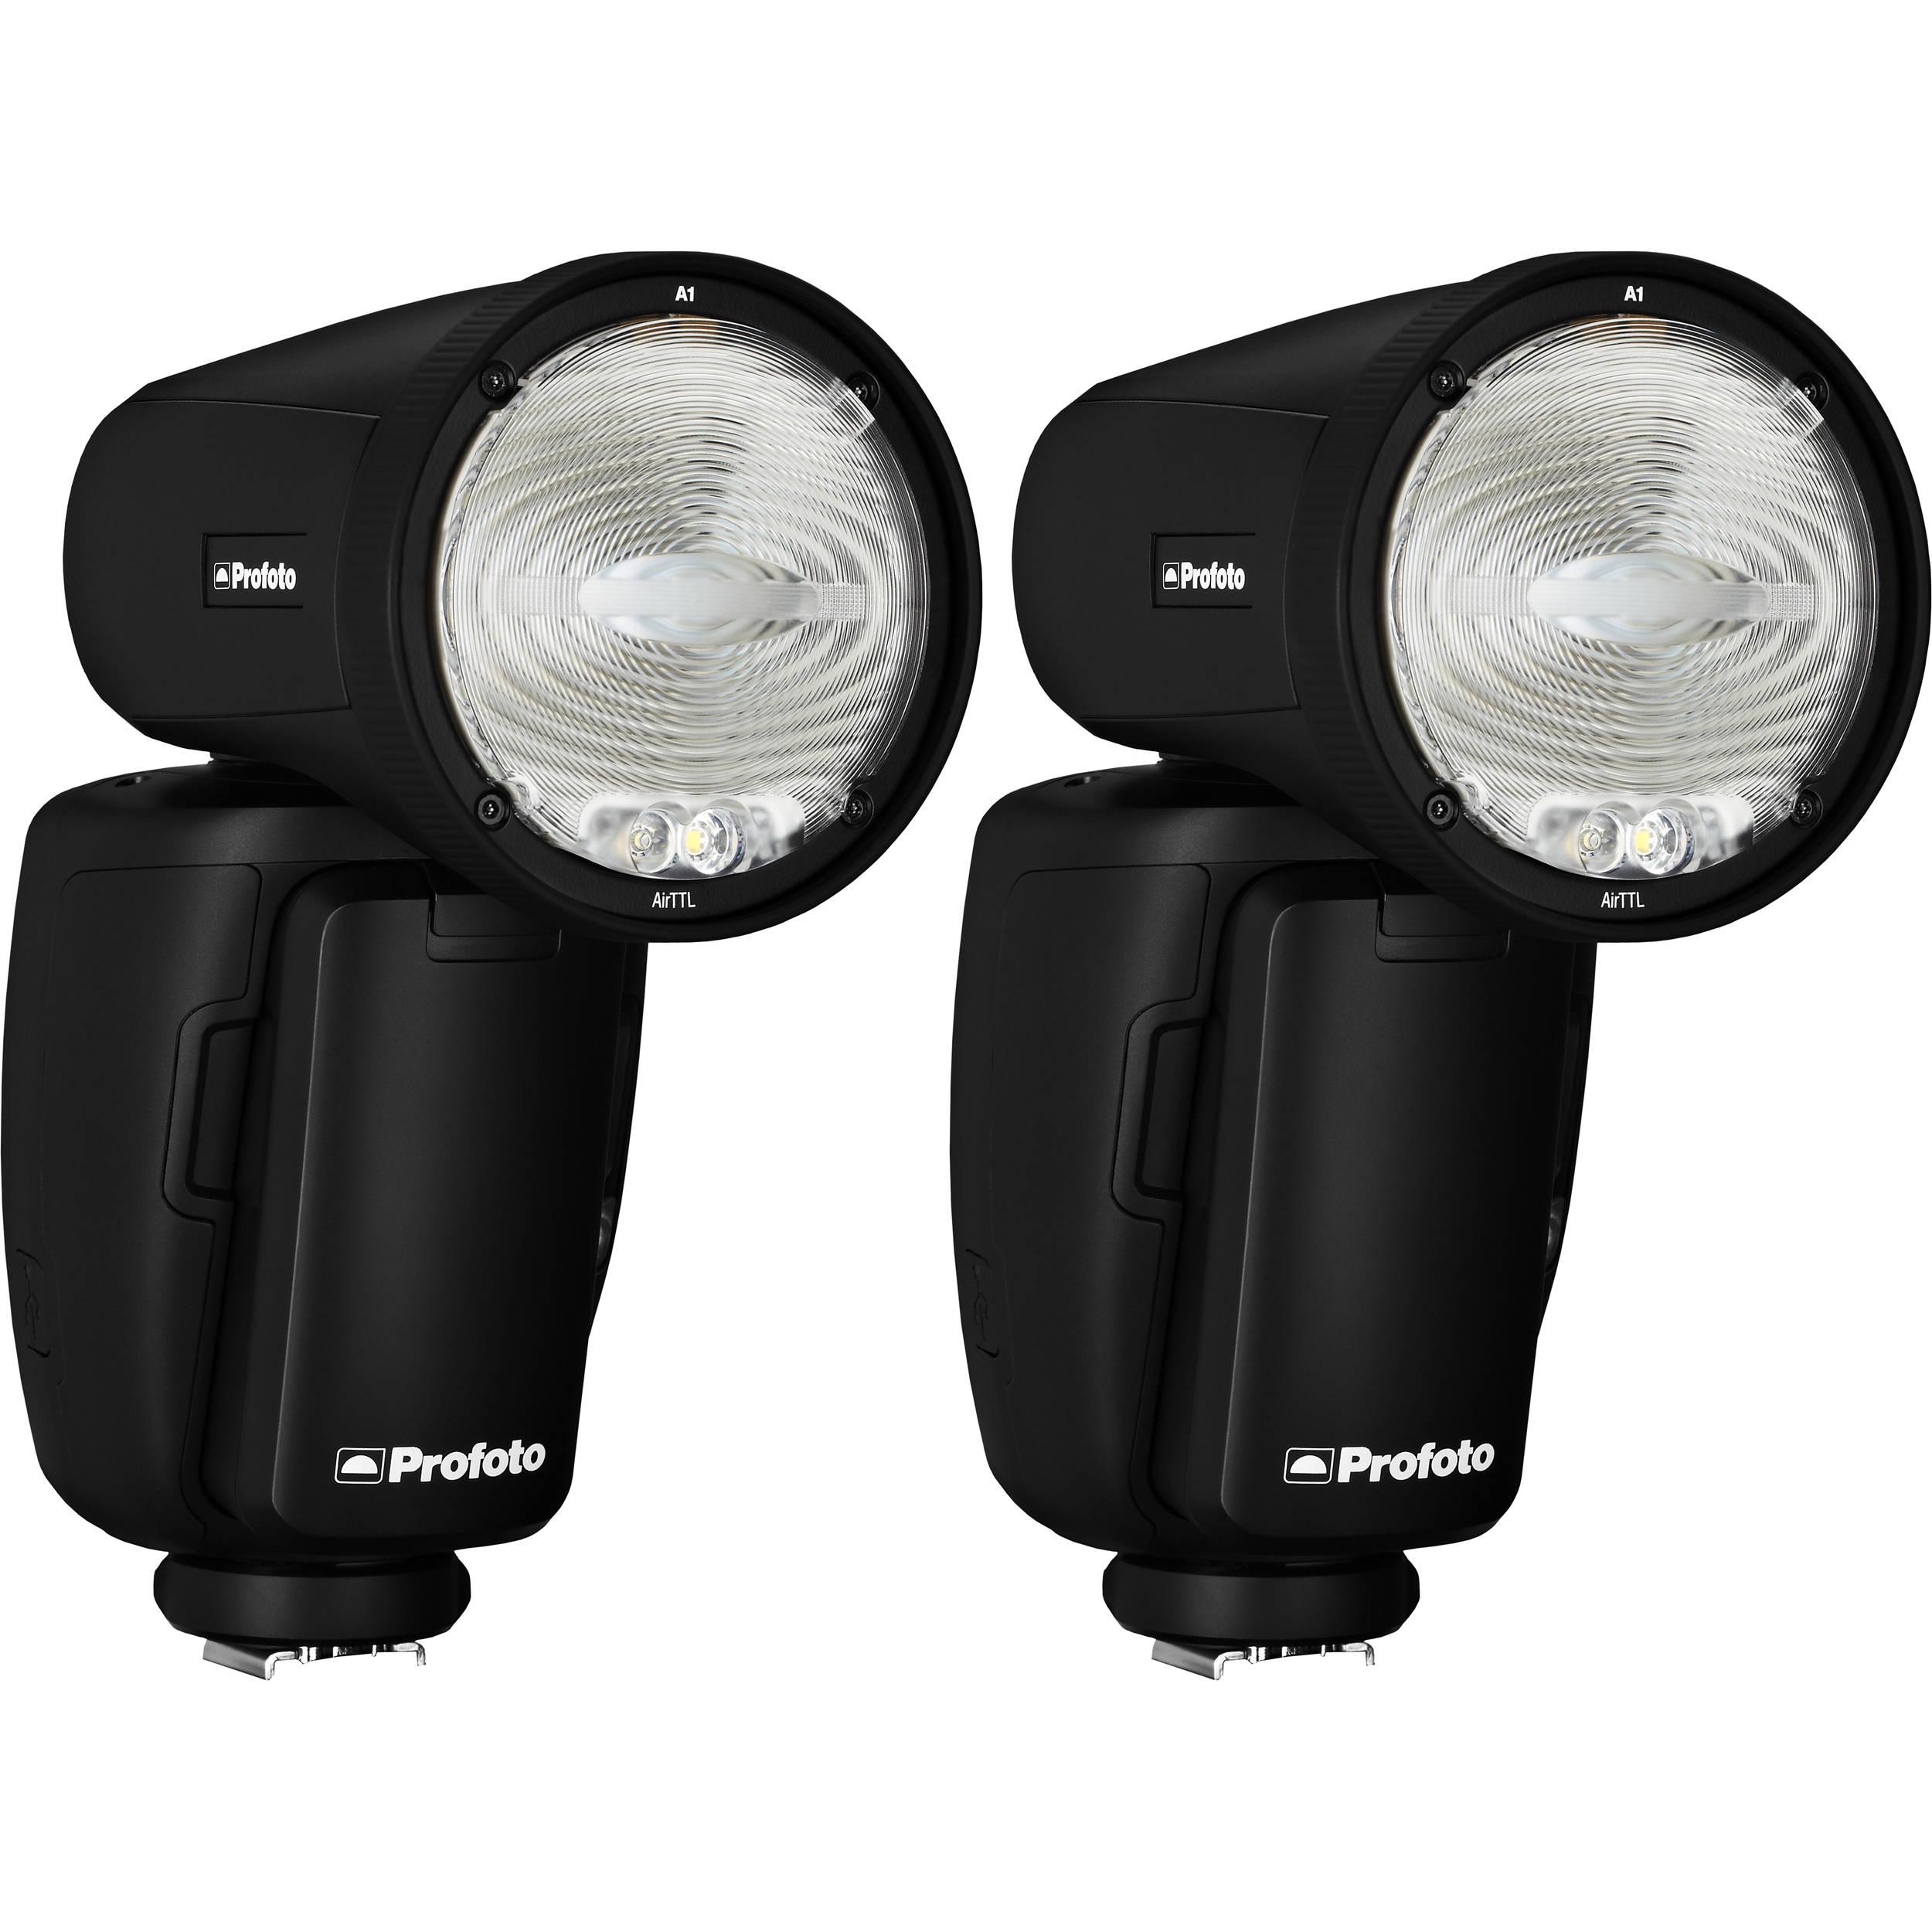 Profoto 901212 A1 Duo Kit for Nikon